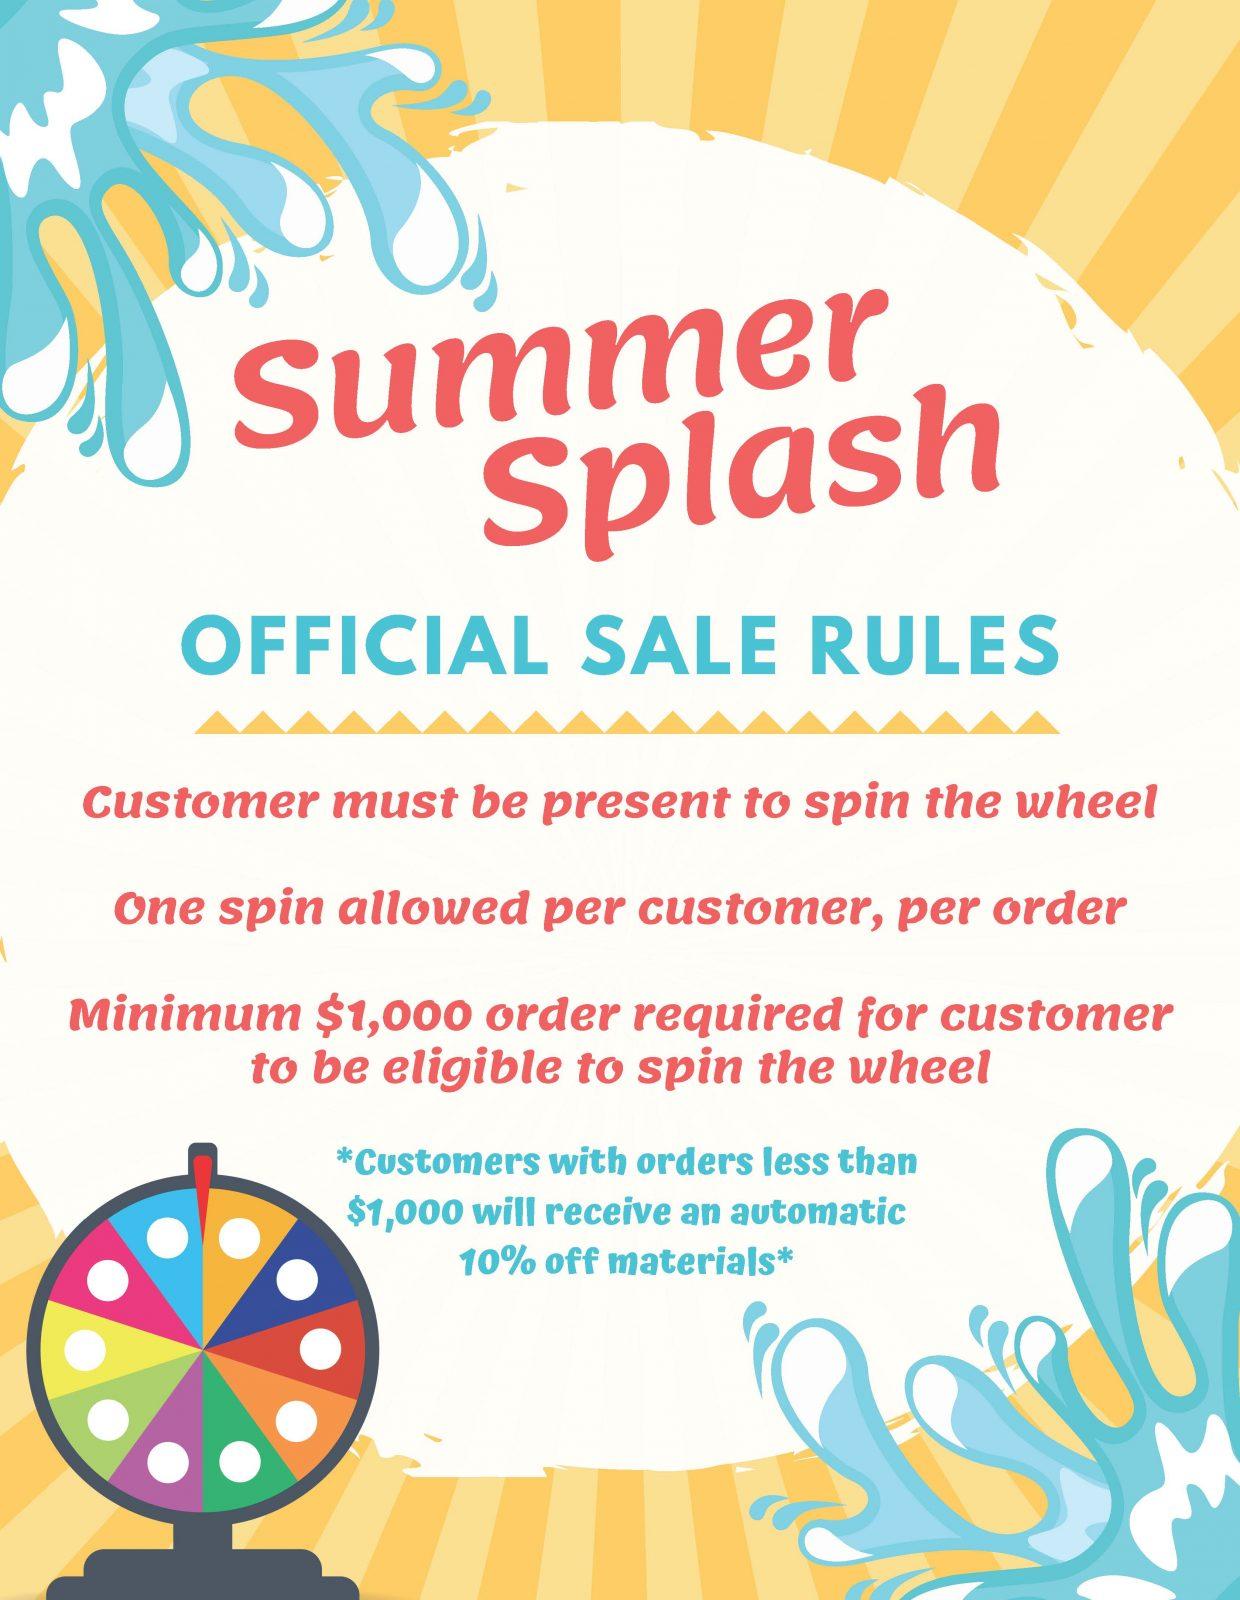 Summer splash sale rules banner | Staff Carpet